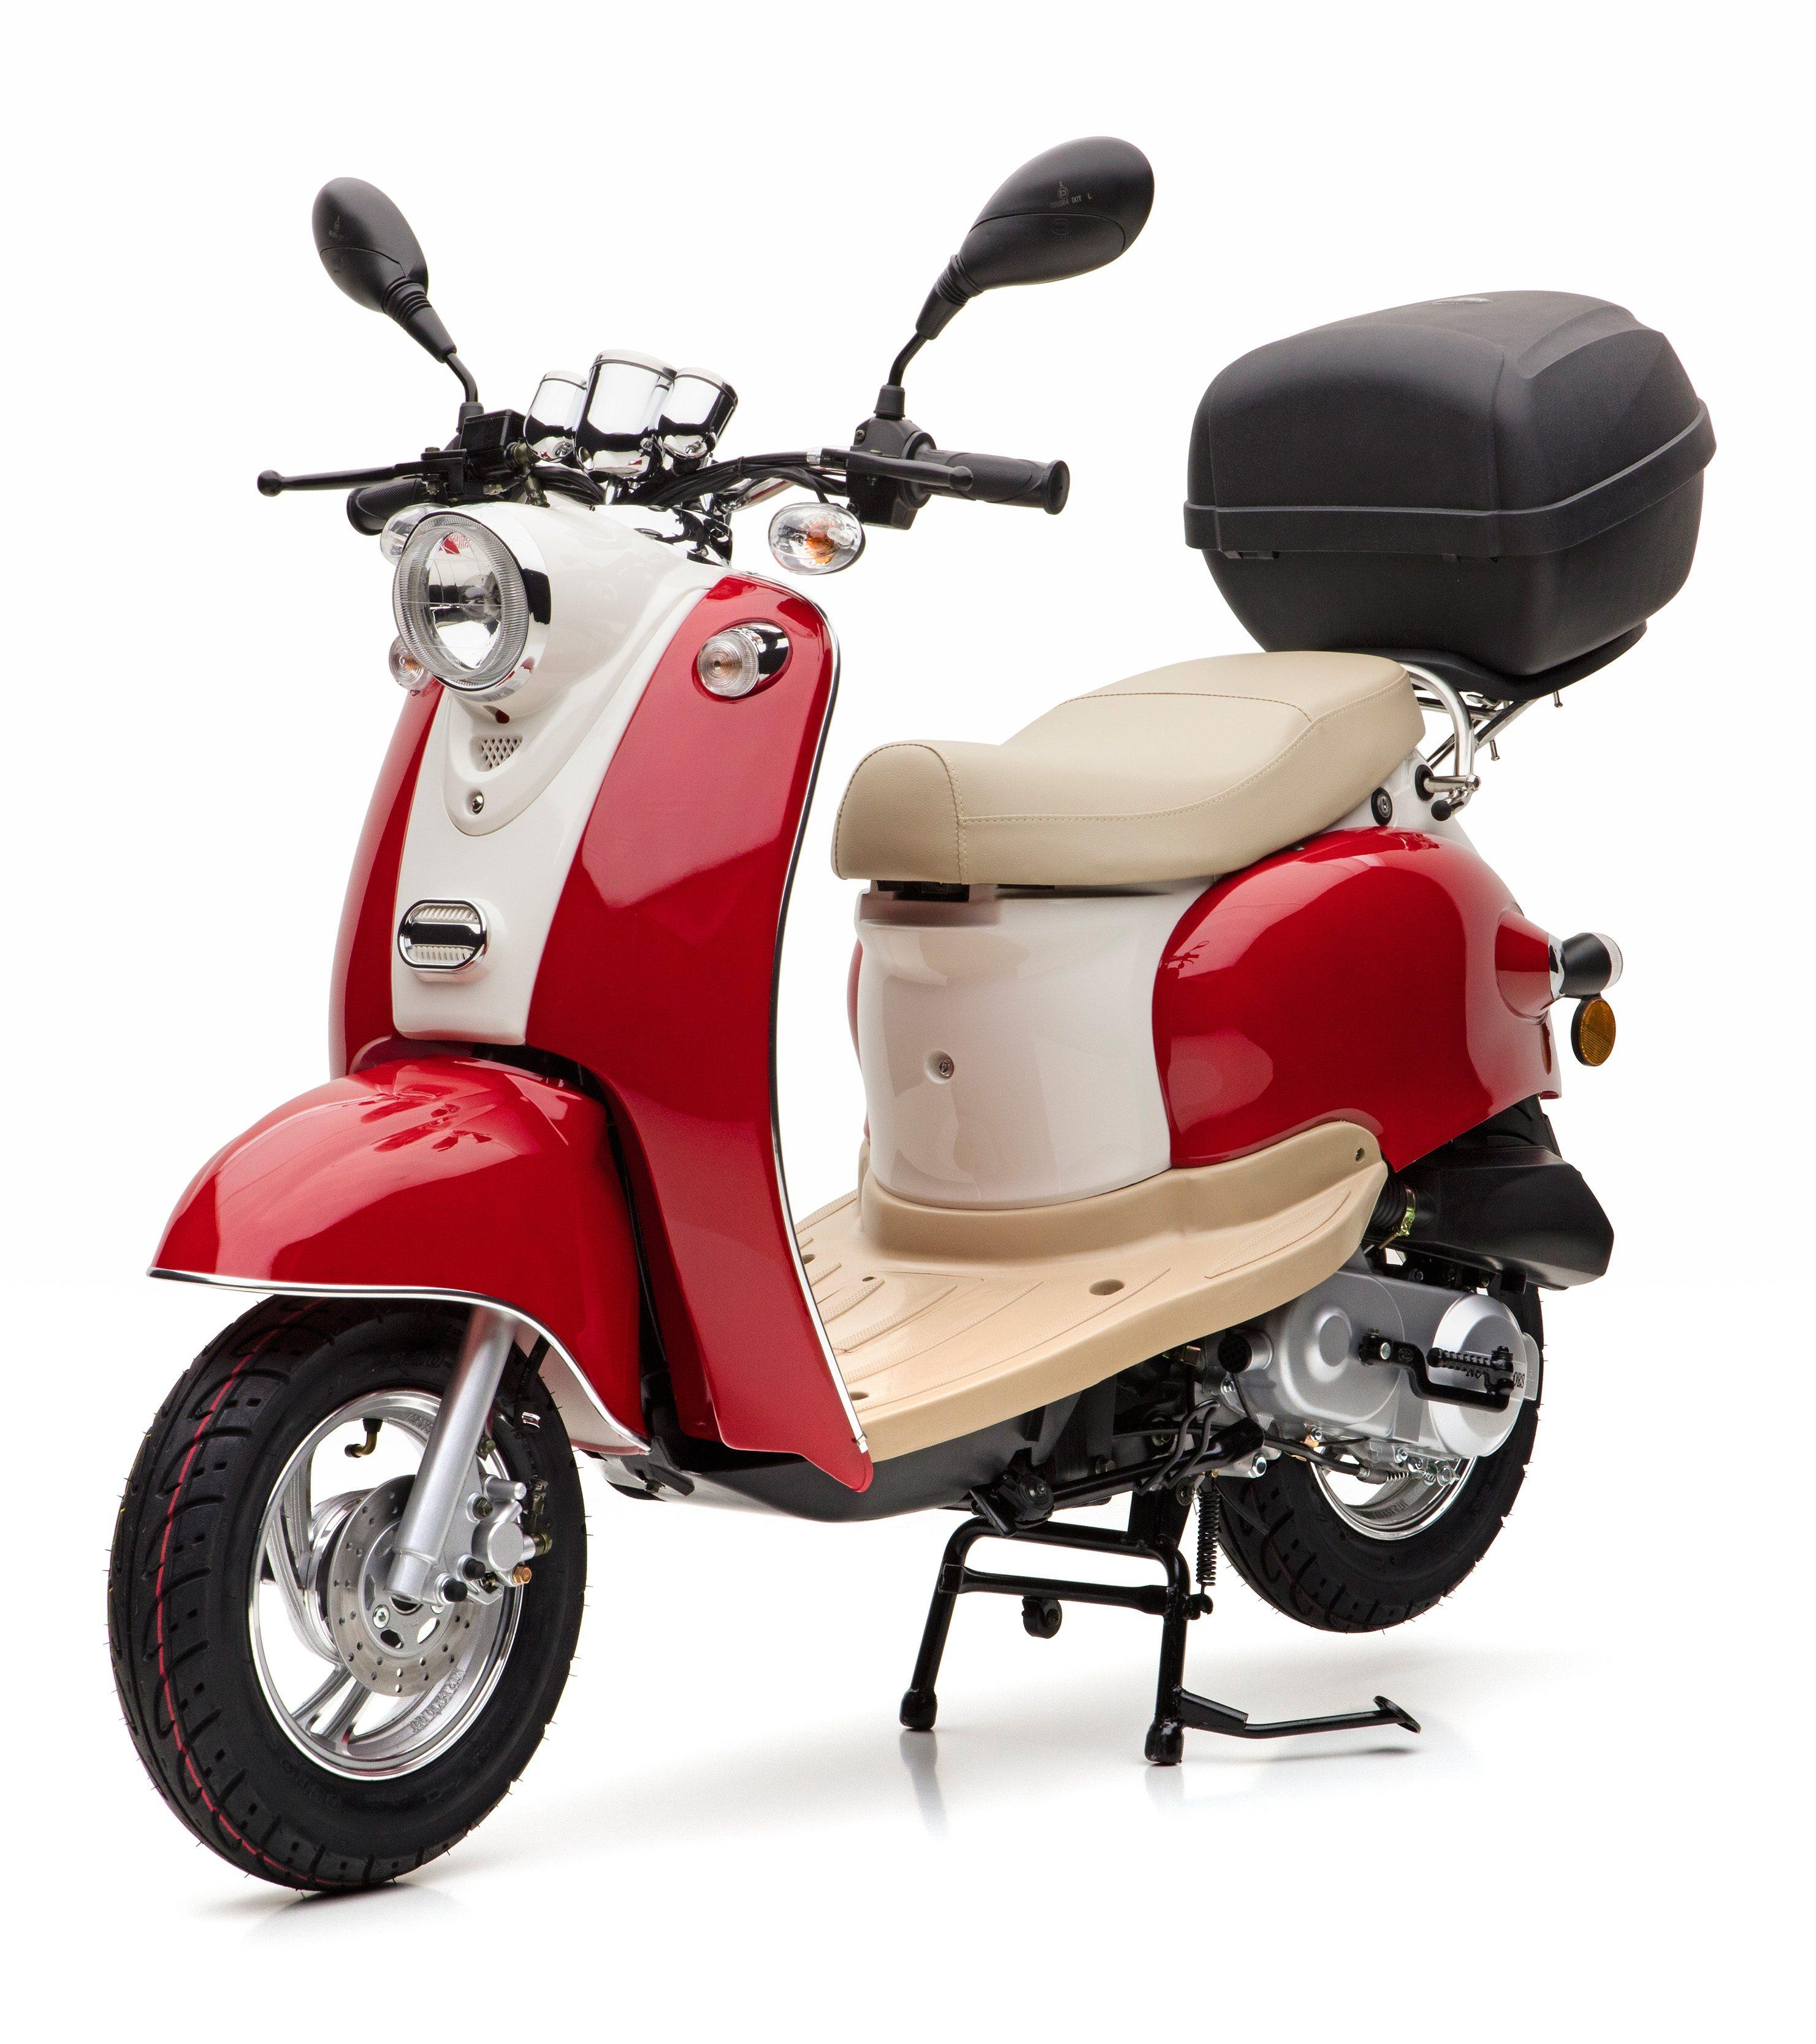 Nova Motors Motorroller inkl. Topcase, 49 ccm, 45 km/h, rot weiß, »Venezia II«